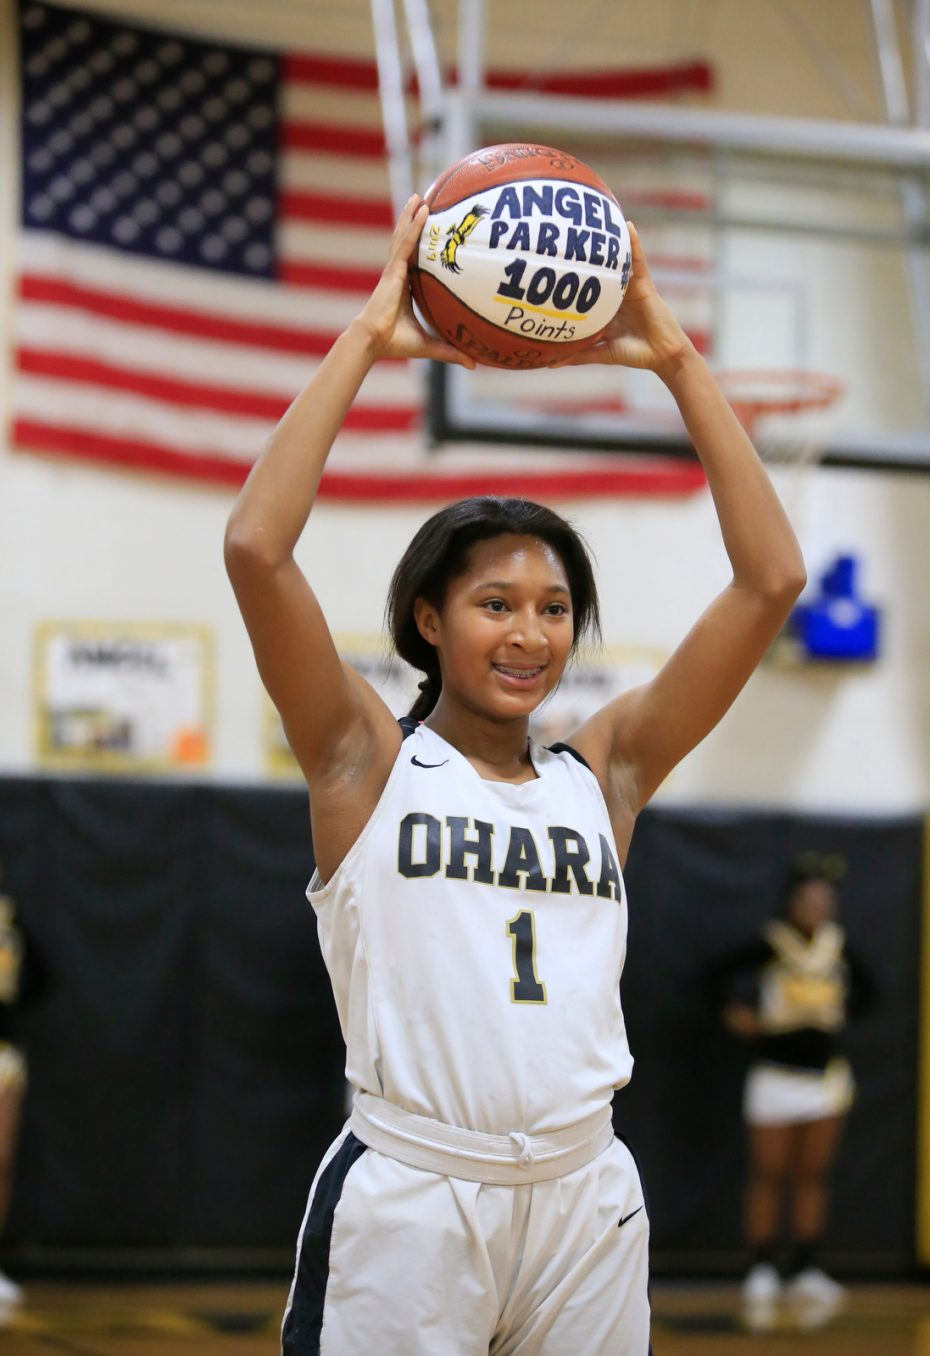 Parker-Angel-Cardinal O'Hara-Williamsville South-high school-Basketball-scull